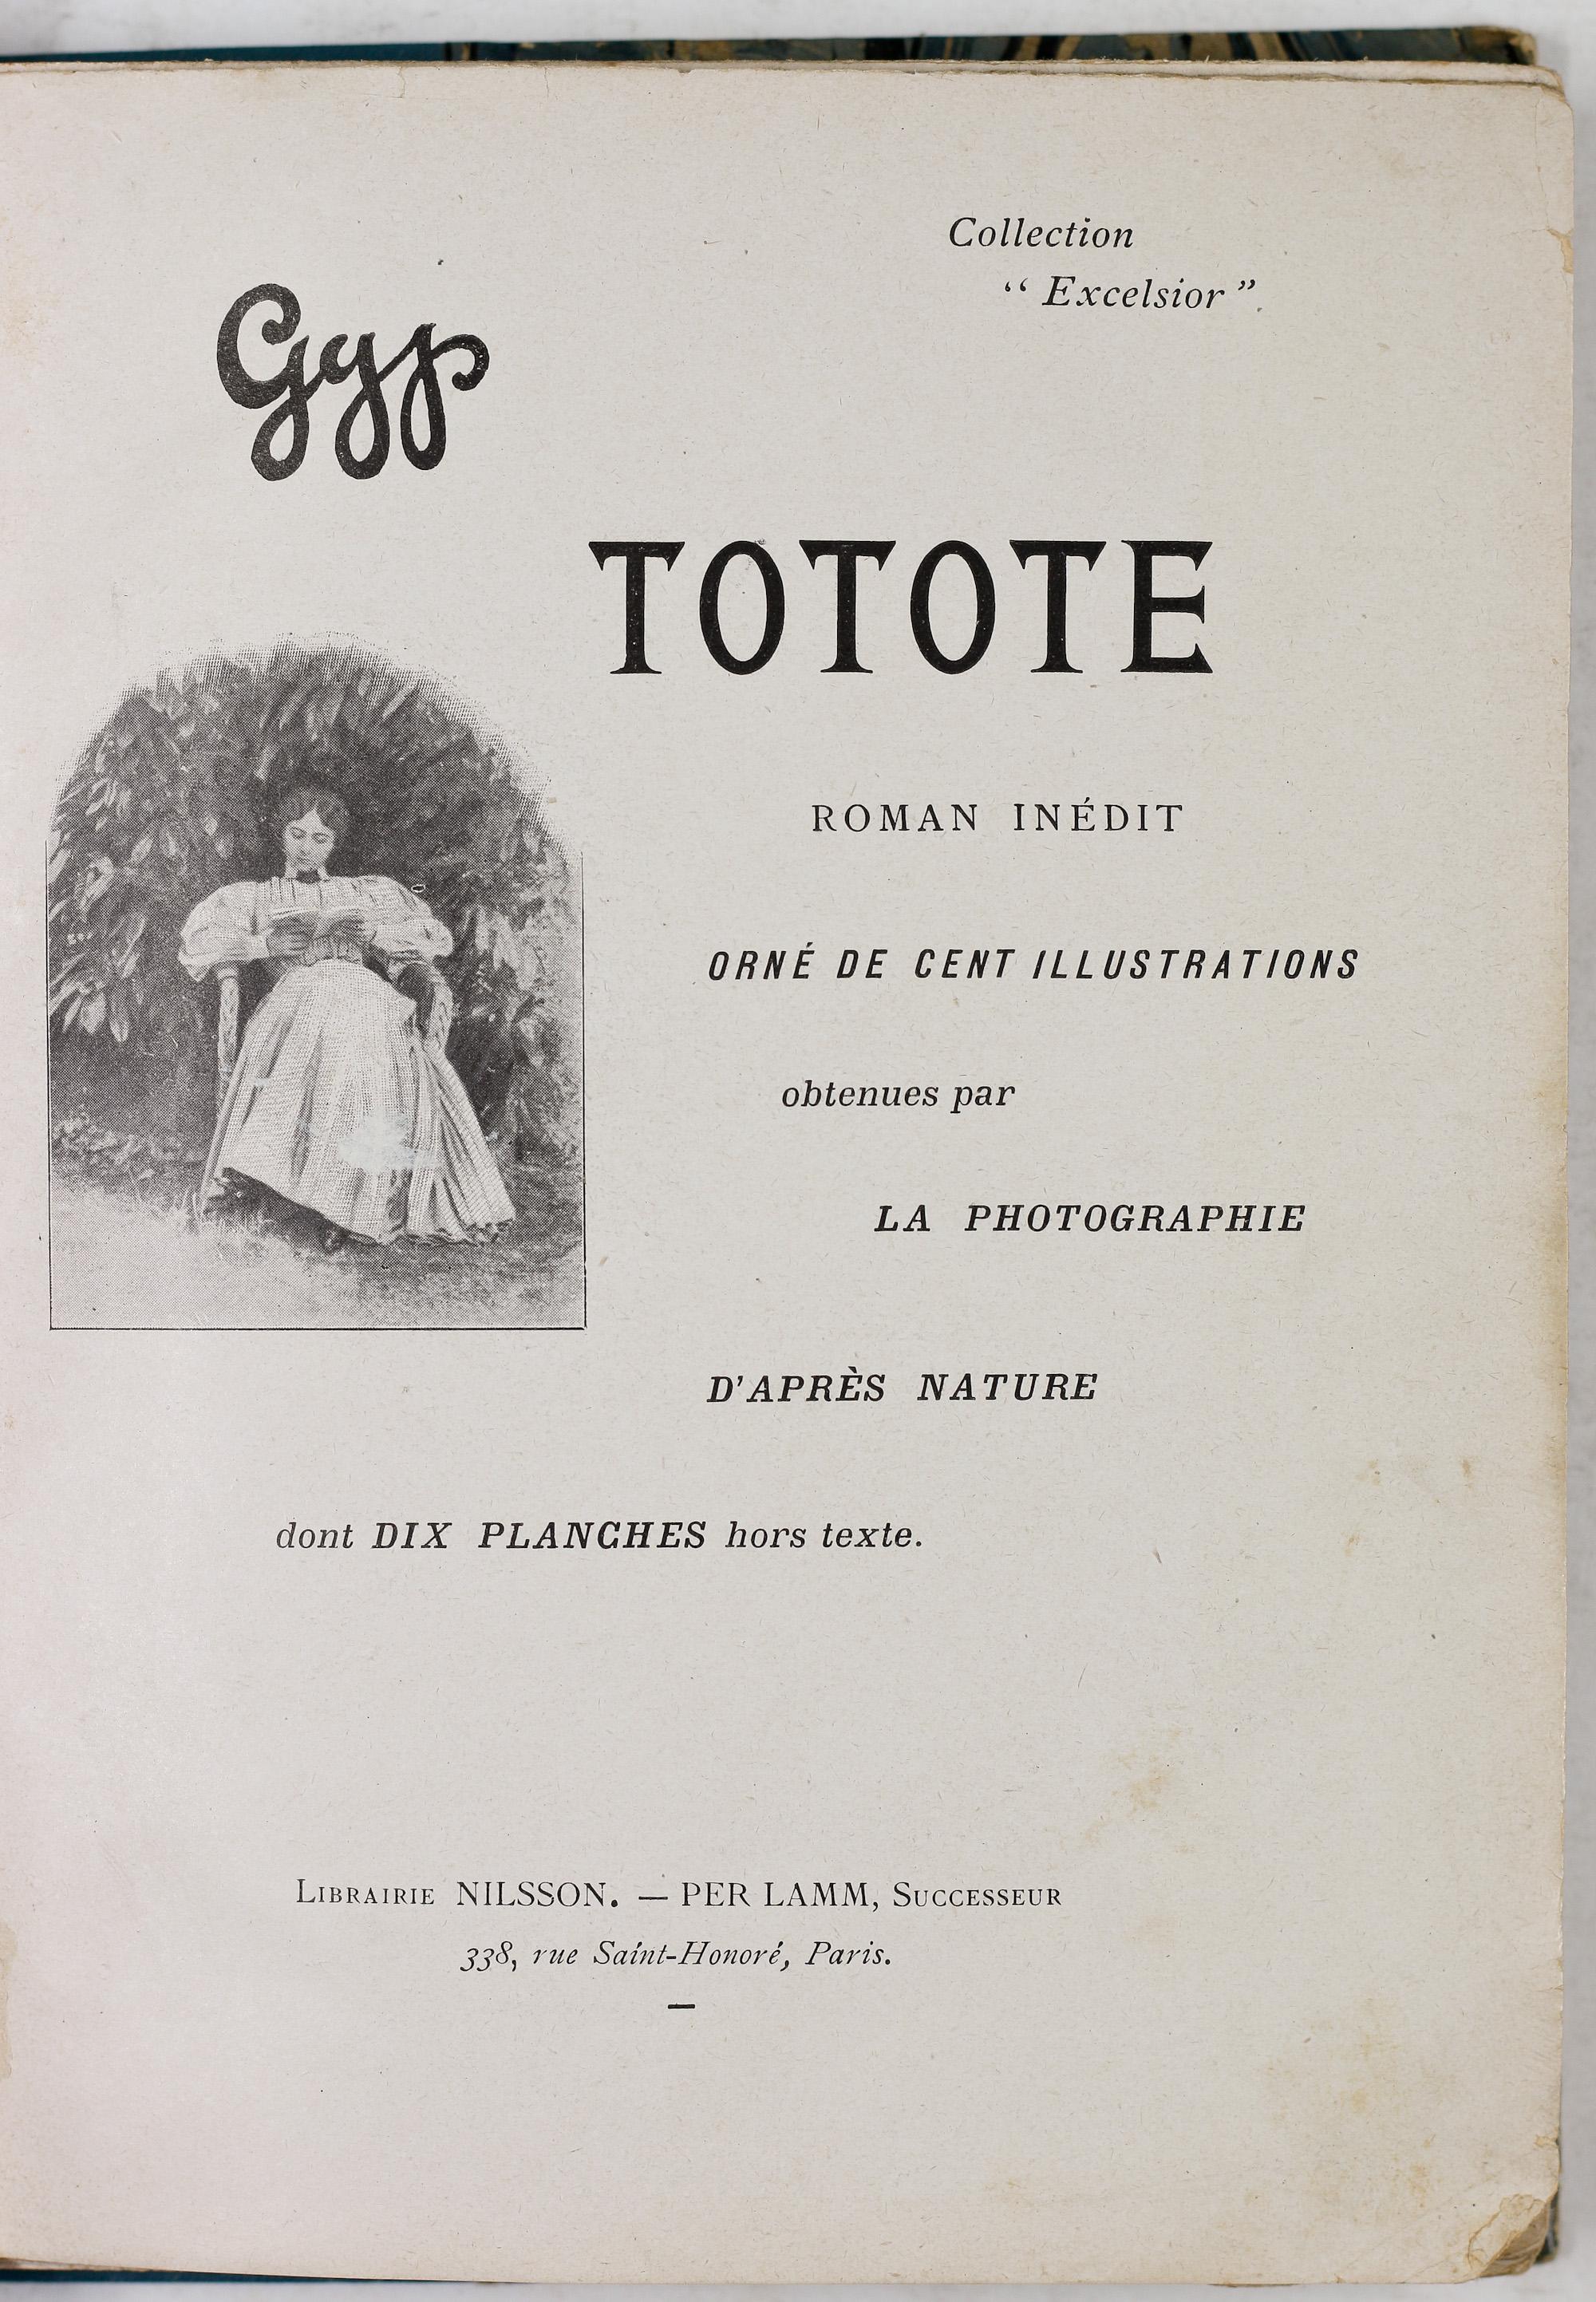 Totote, Gyp